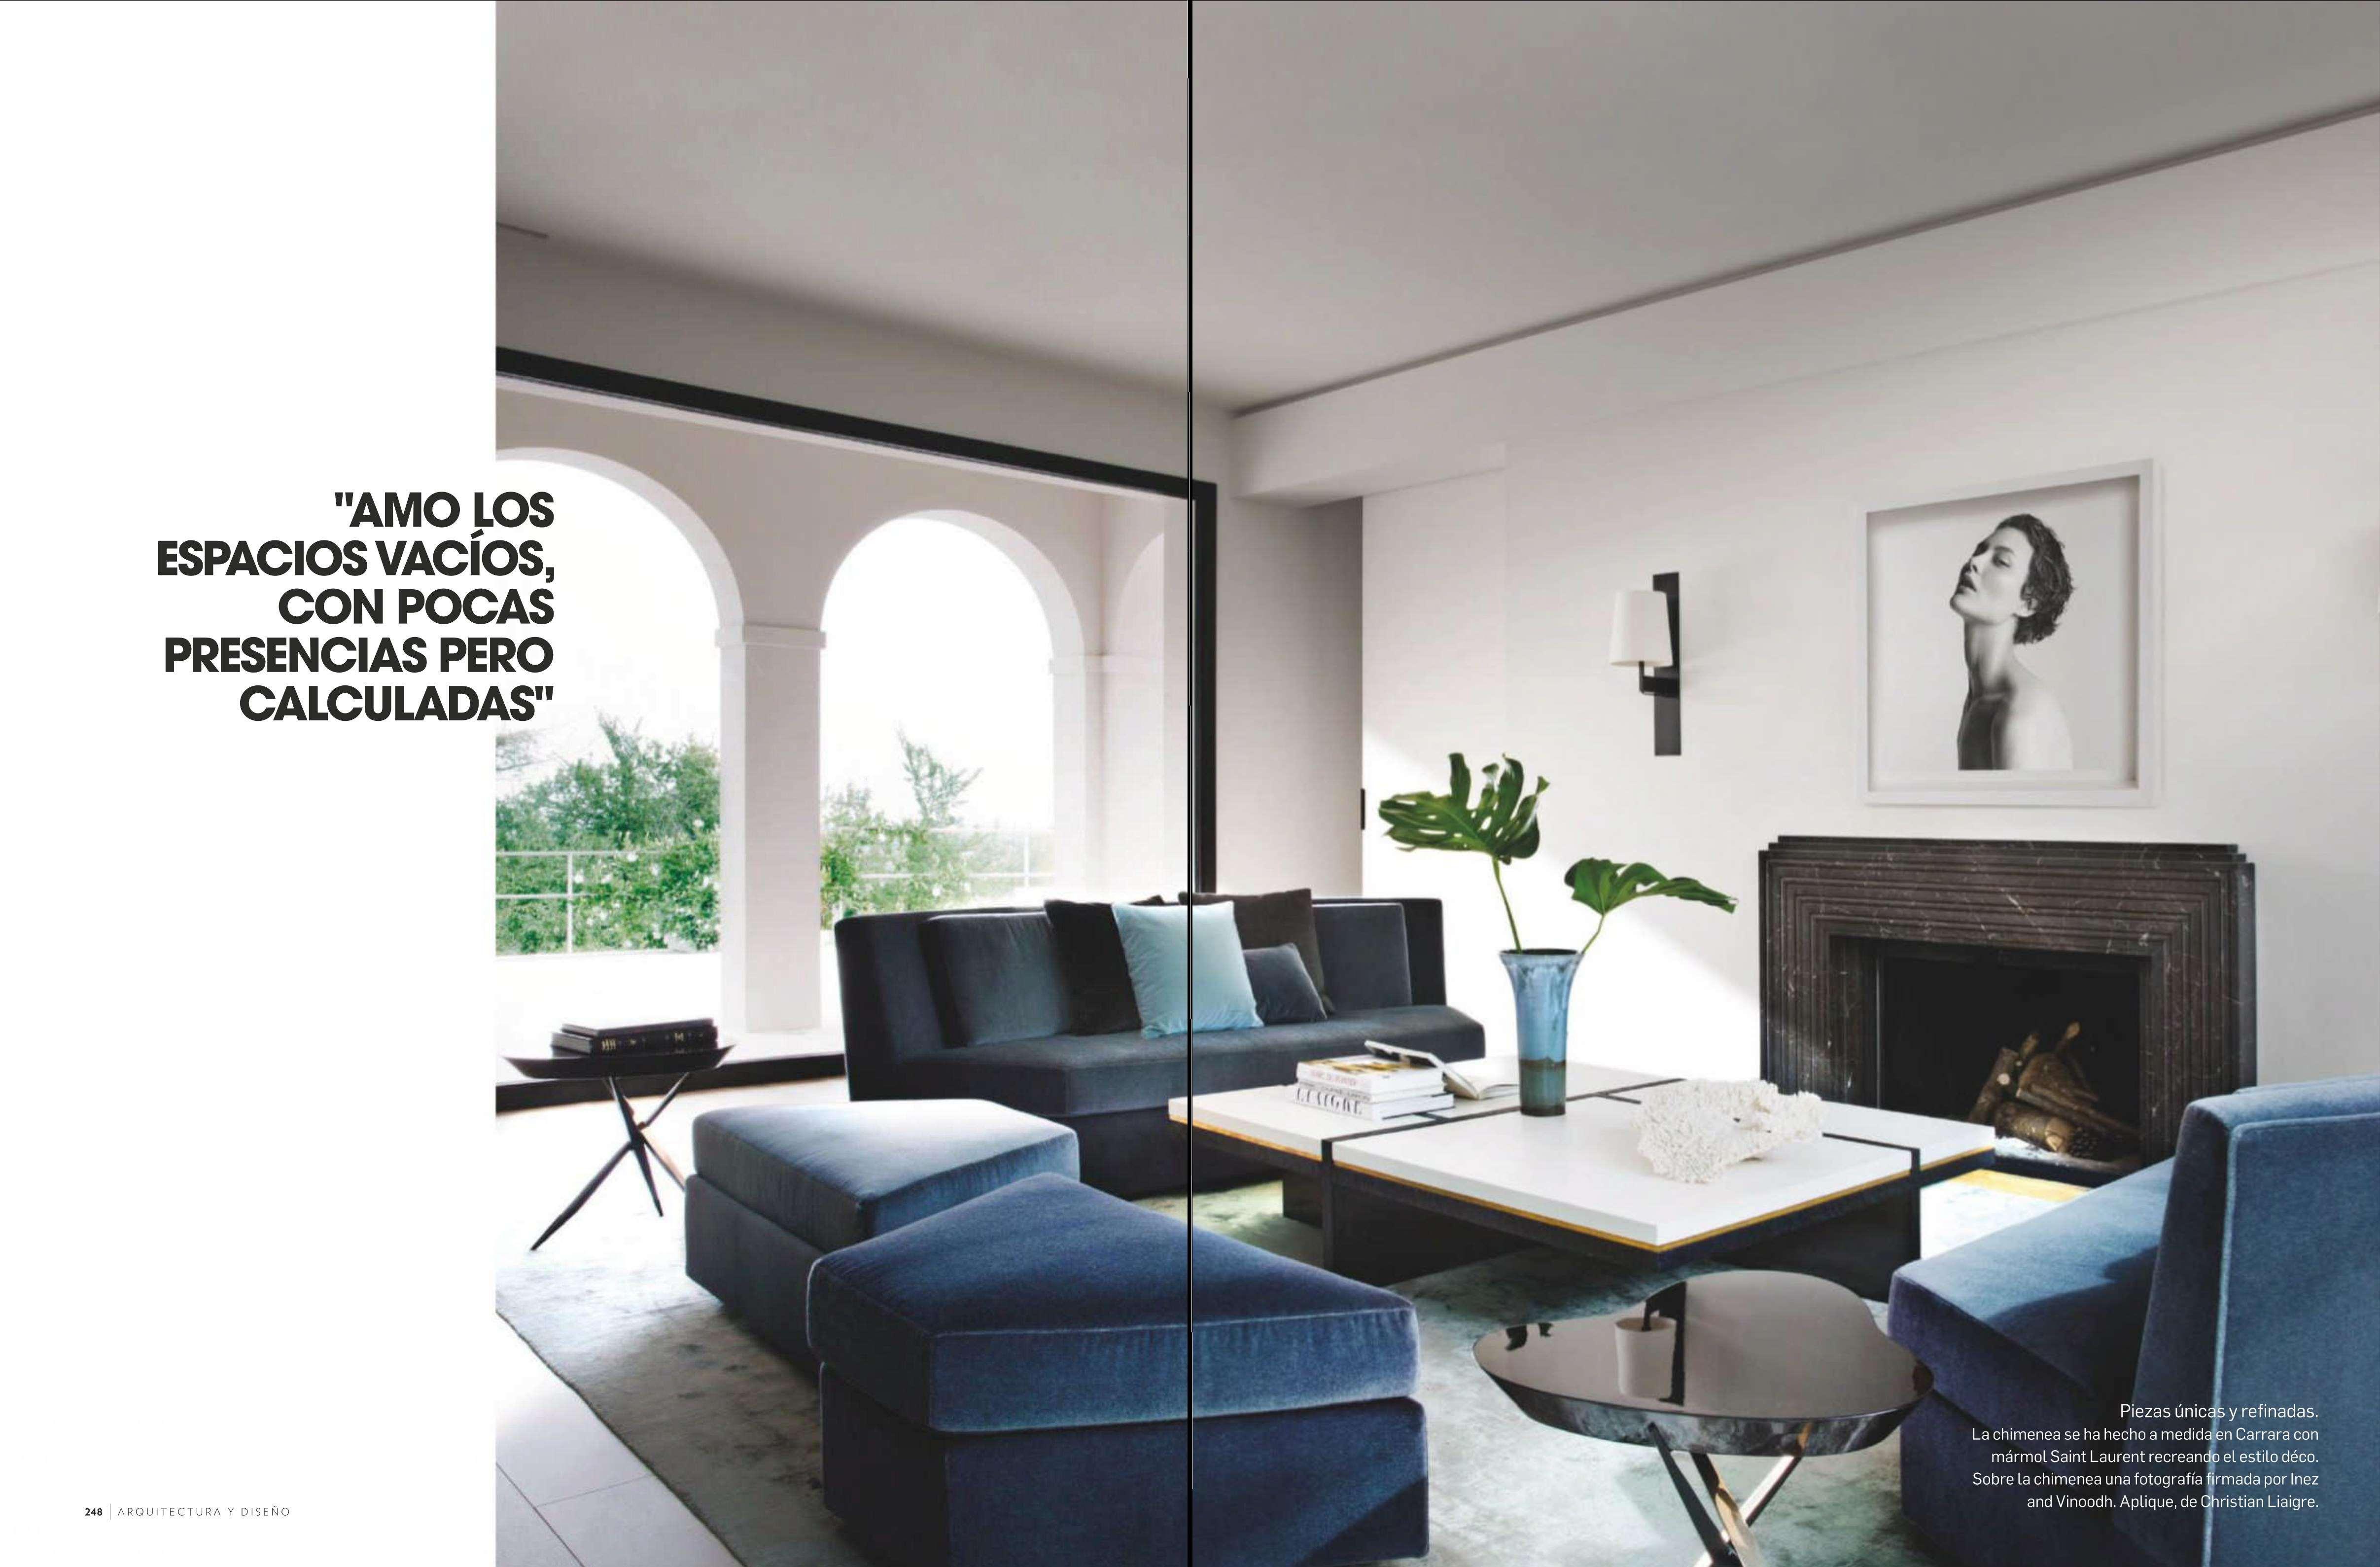 Arquitectura y diseno spa golran - Salon diseno ...